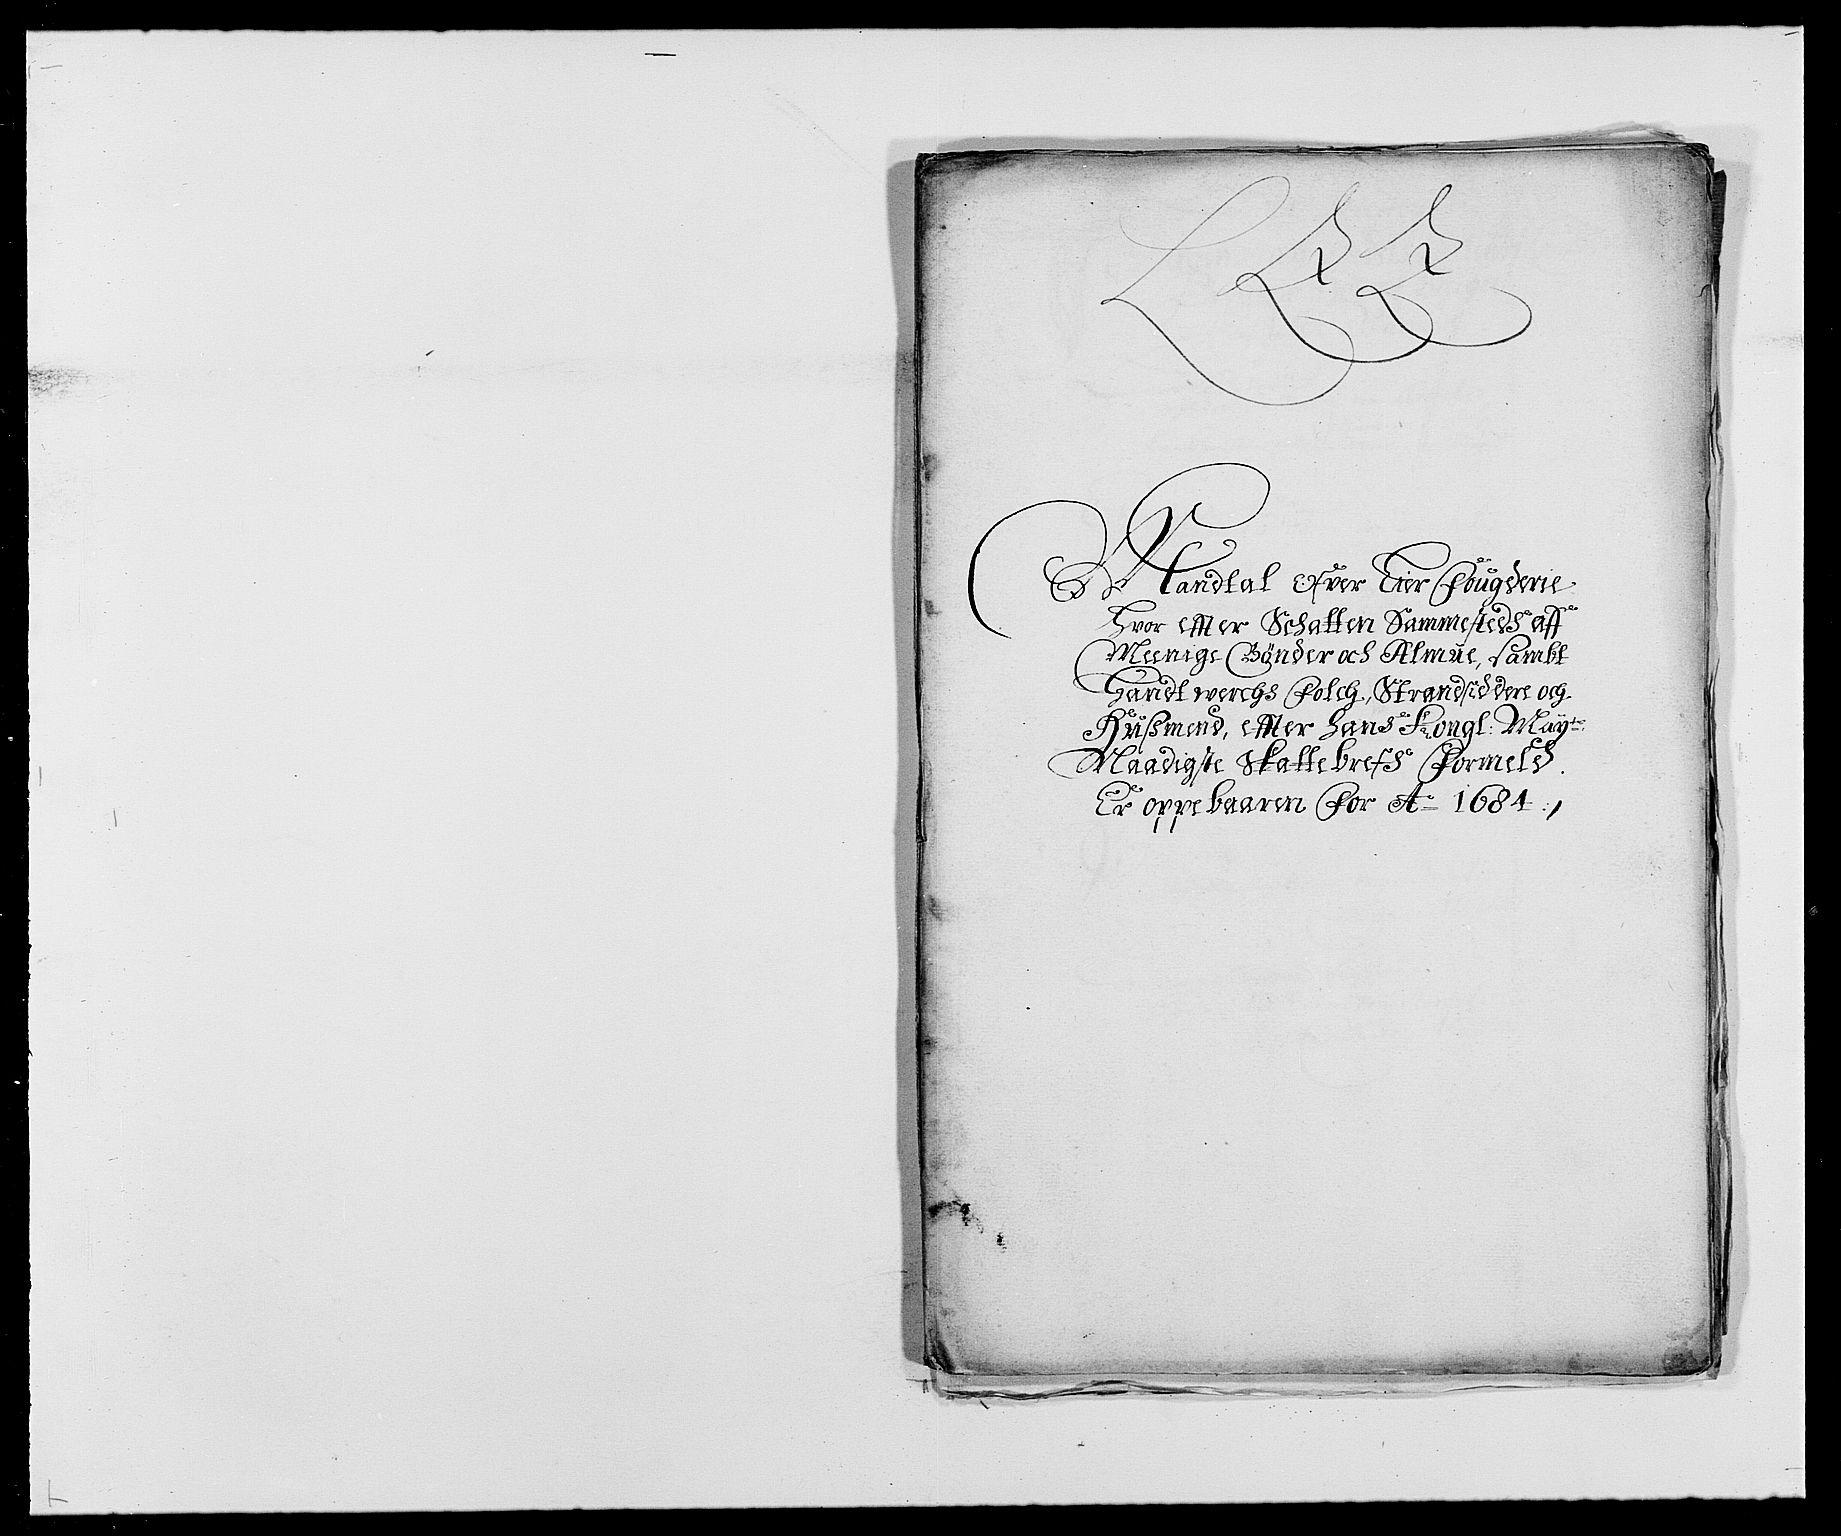 RA, Rentekammeret inntil 1814, Reviderte regnskaper, Fogderegnskap, R27/L1687: Fogderegnskap Lier, 1678-1686, s. 85